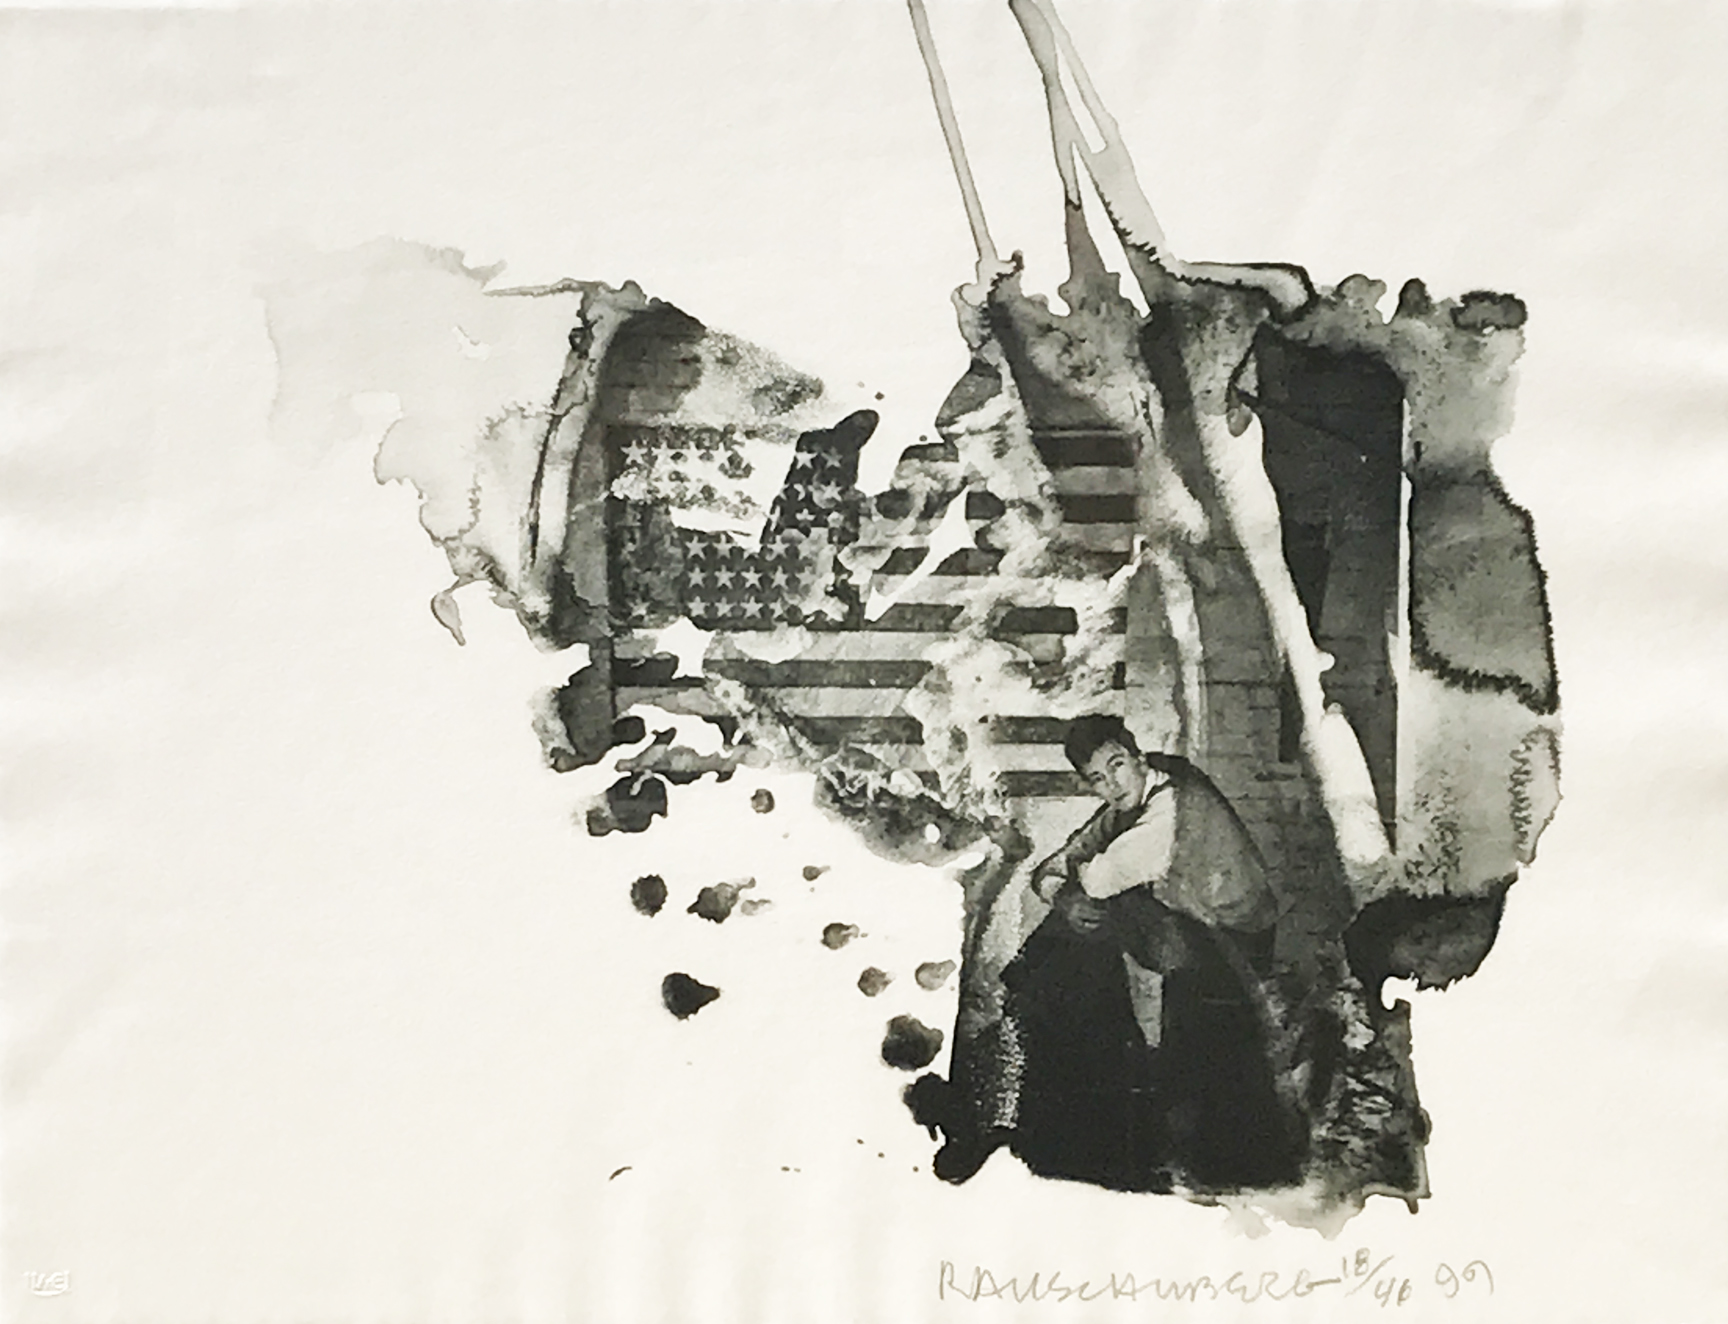 Jap (Ruminations), 1999. 99.E007.